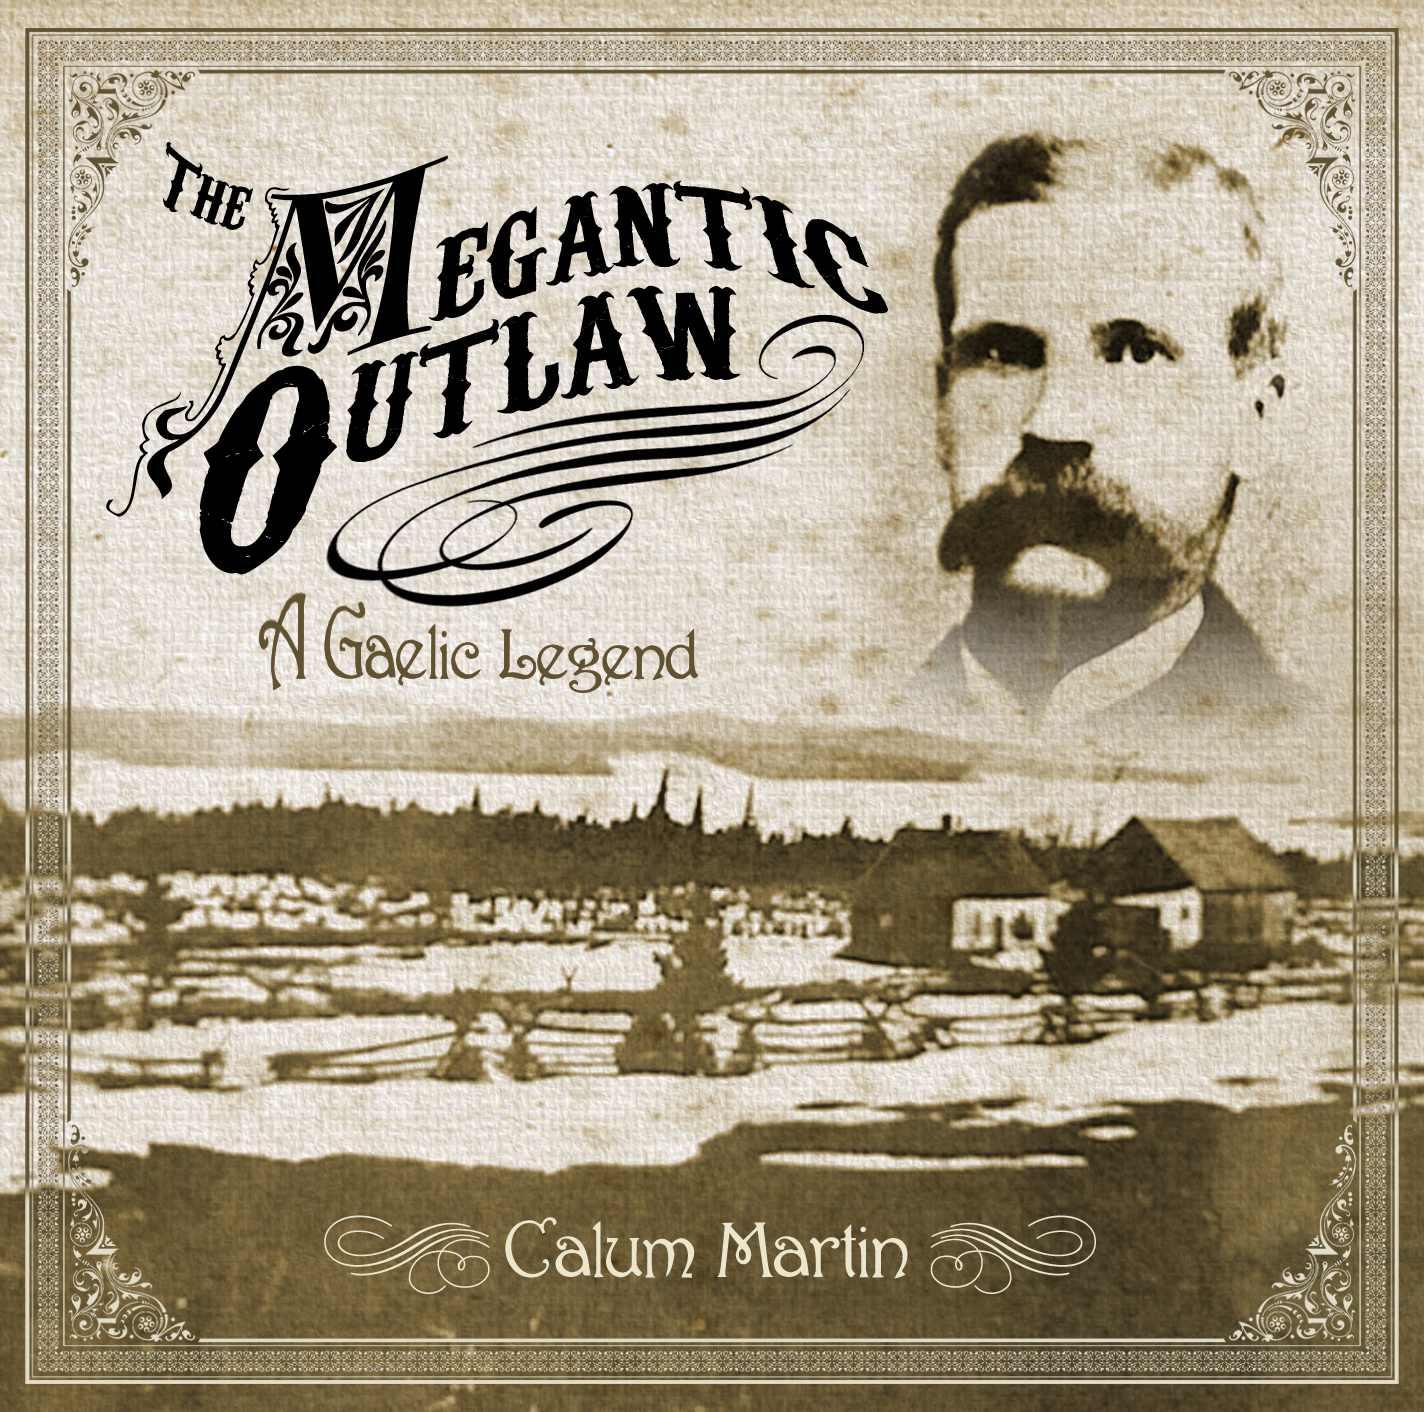 The Megantic Outlaw